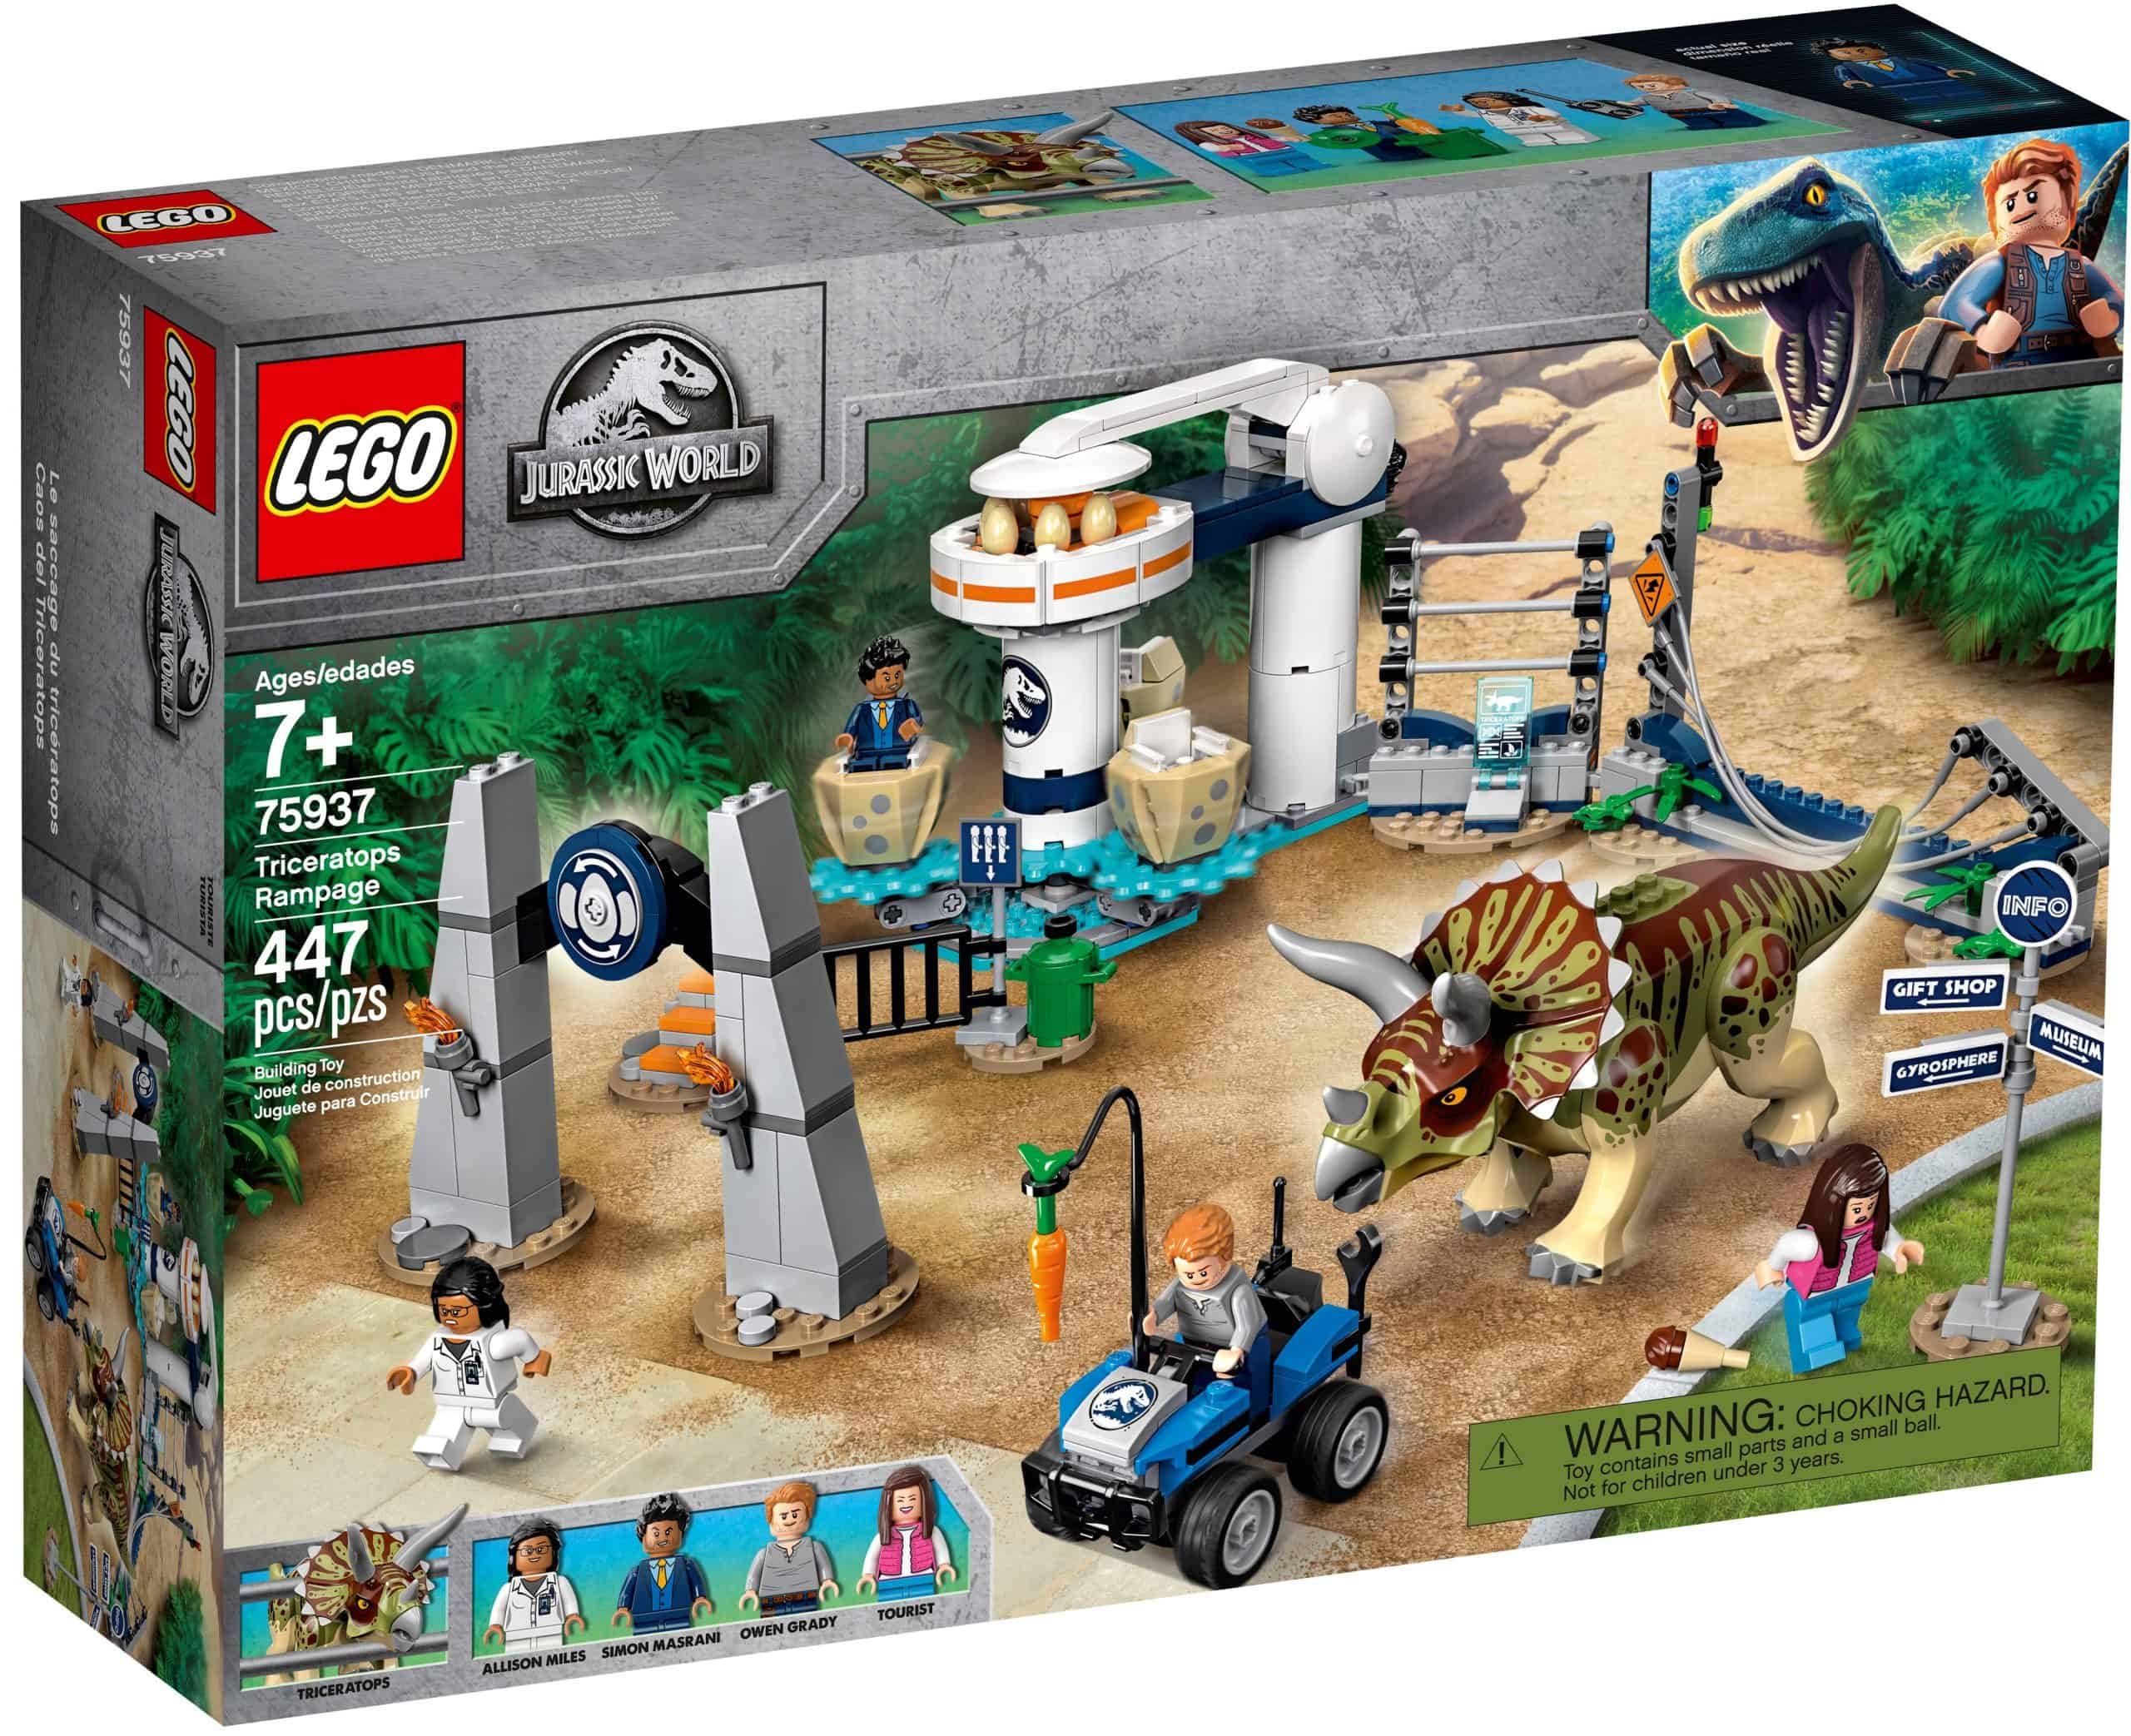 lego 75937 triceratops ravage scaled